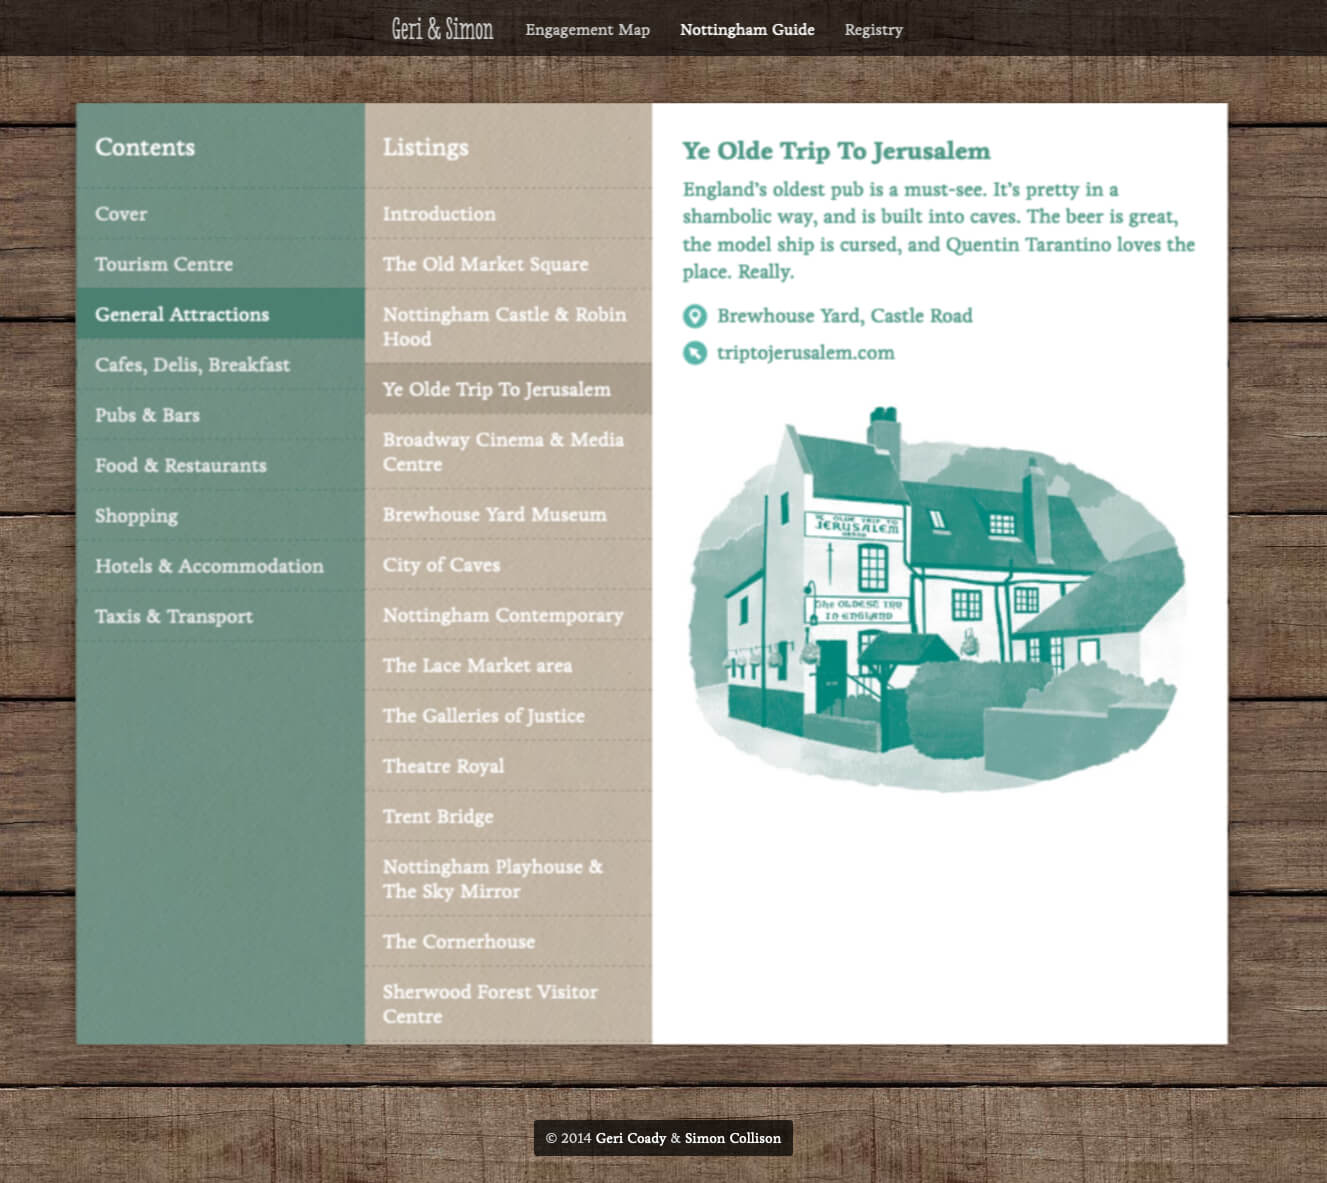 Web Nottingham guide showing Ye Olde Trip to Jerusalem pub